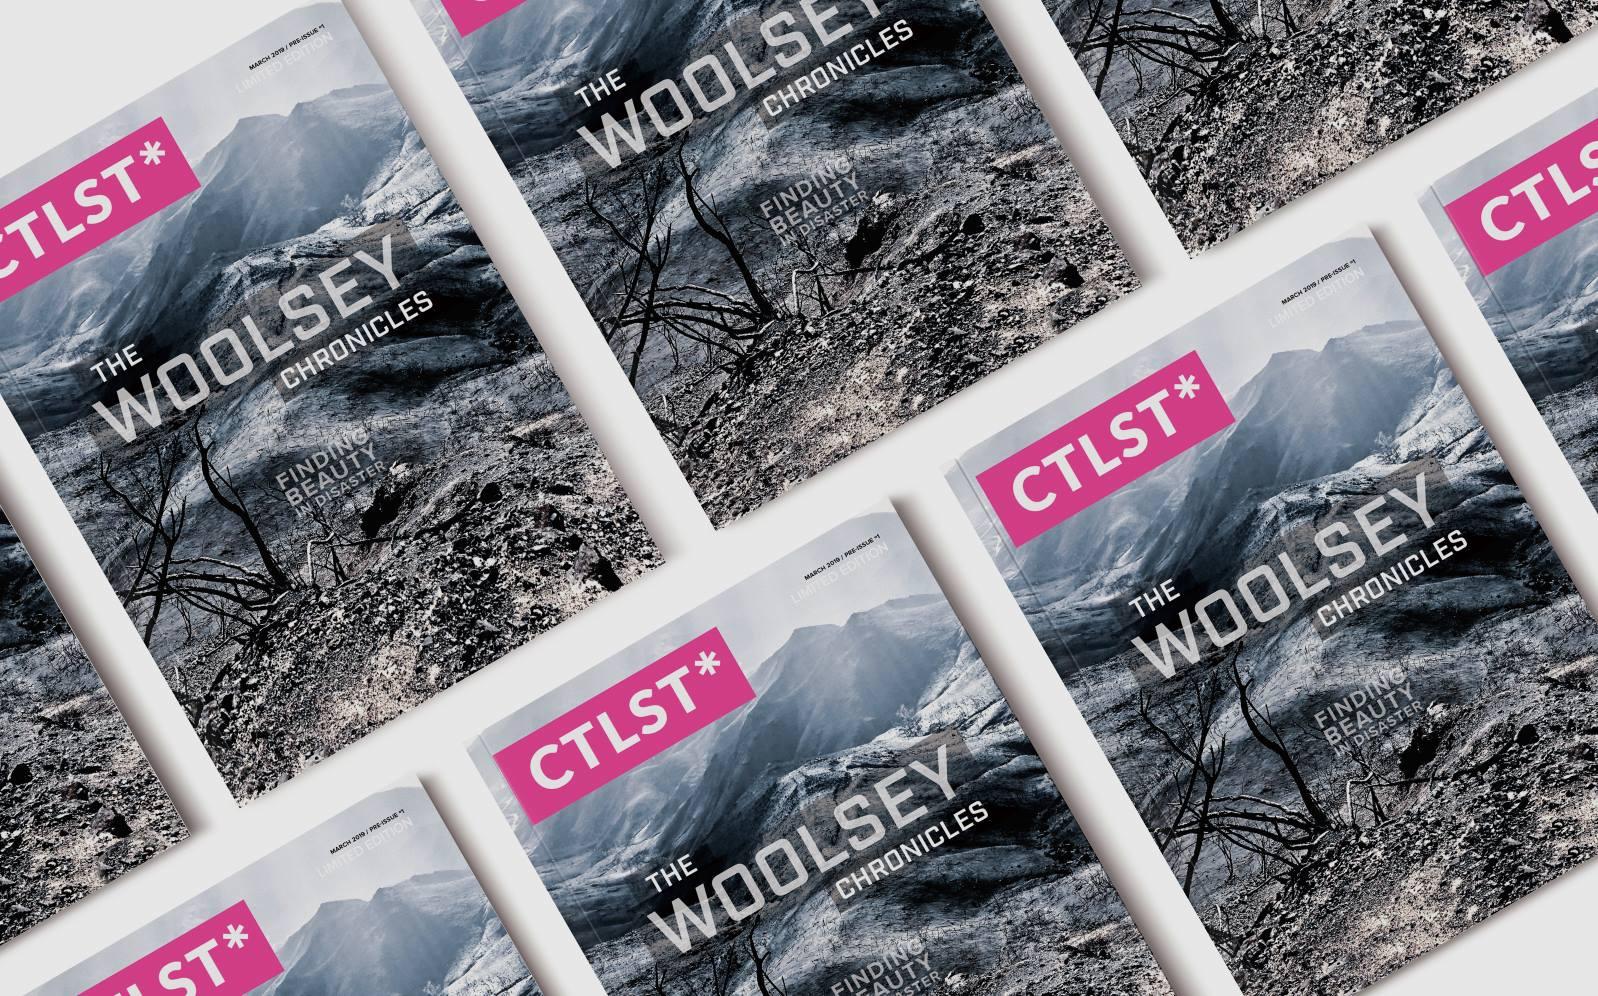 woolsey books.jpg